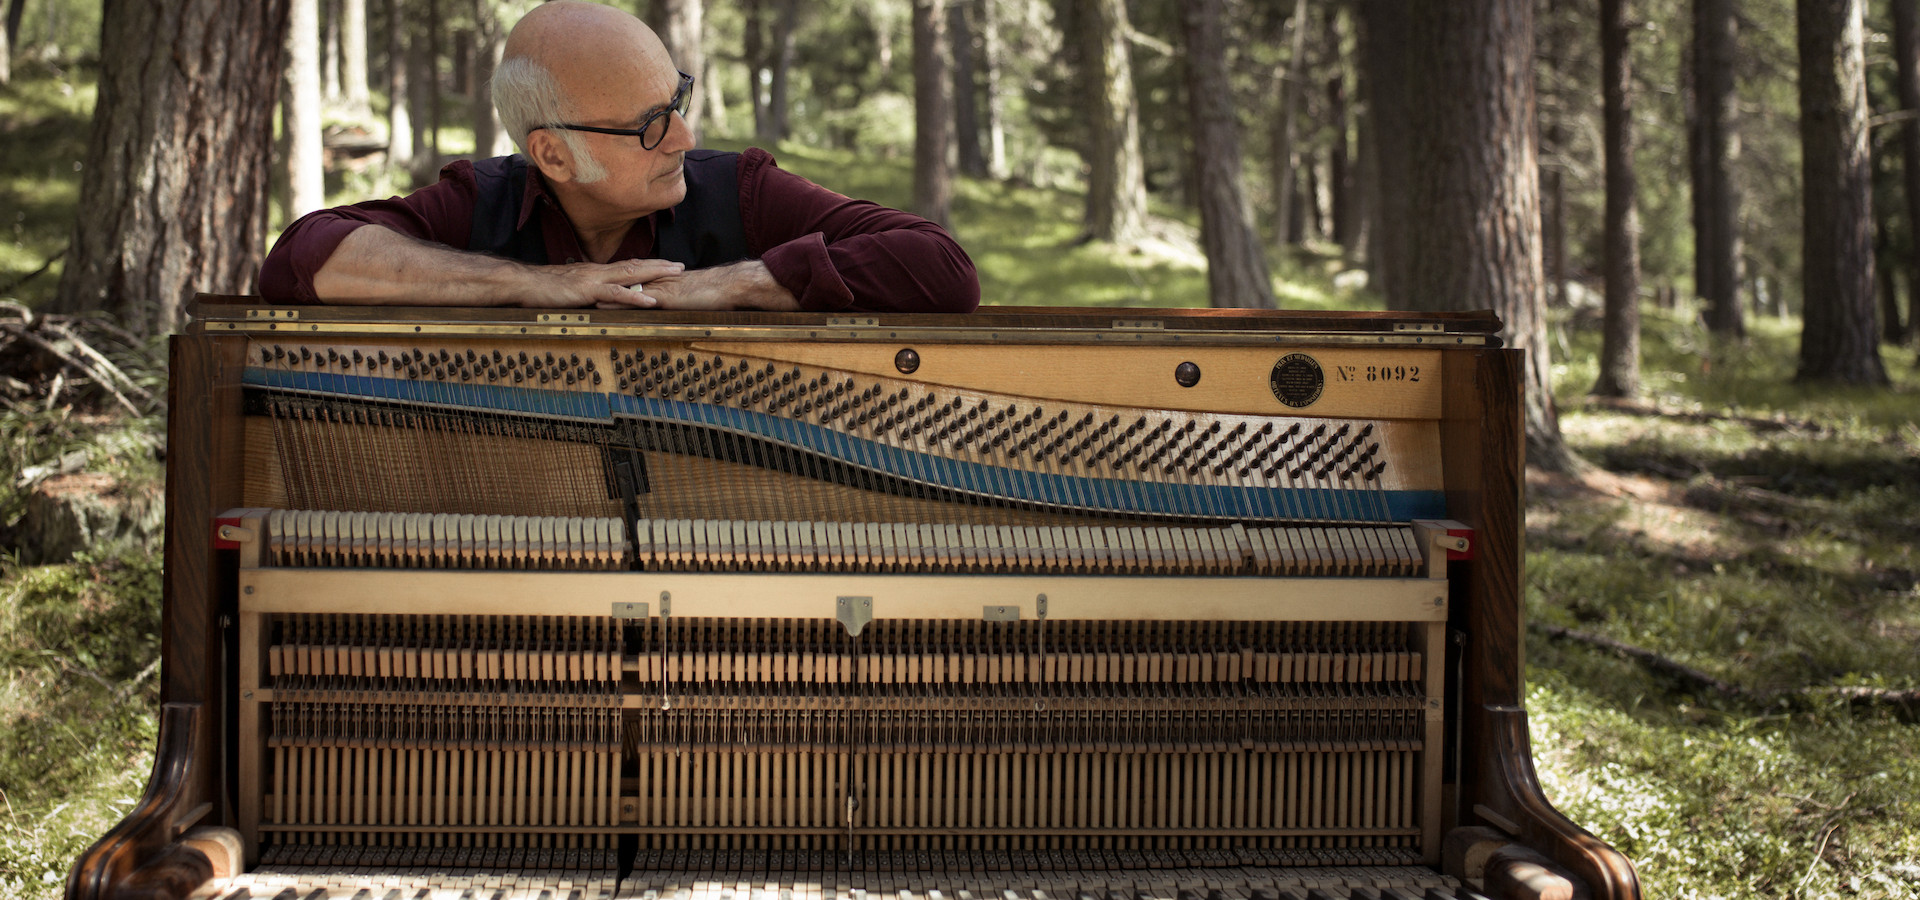 Людовико Эйнауди 2.0. Simple Music Ensemble. Концерт в оранжерее фото